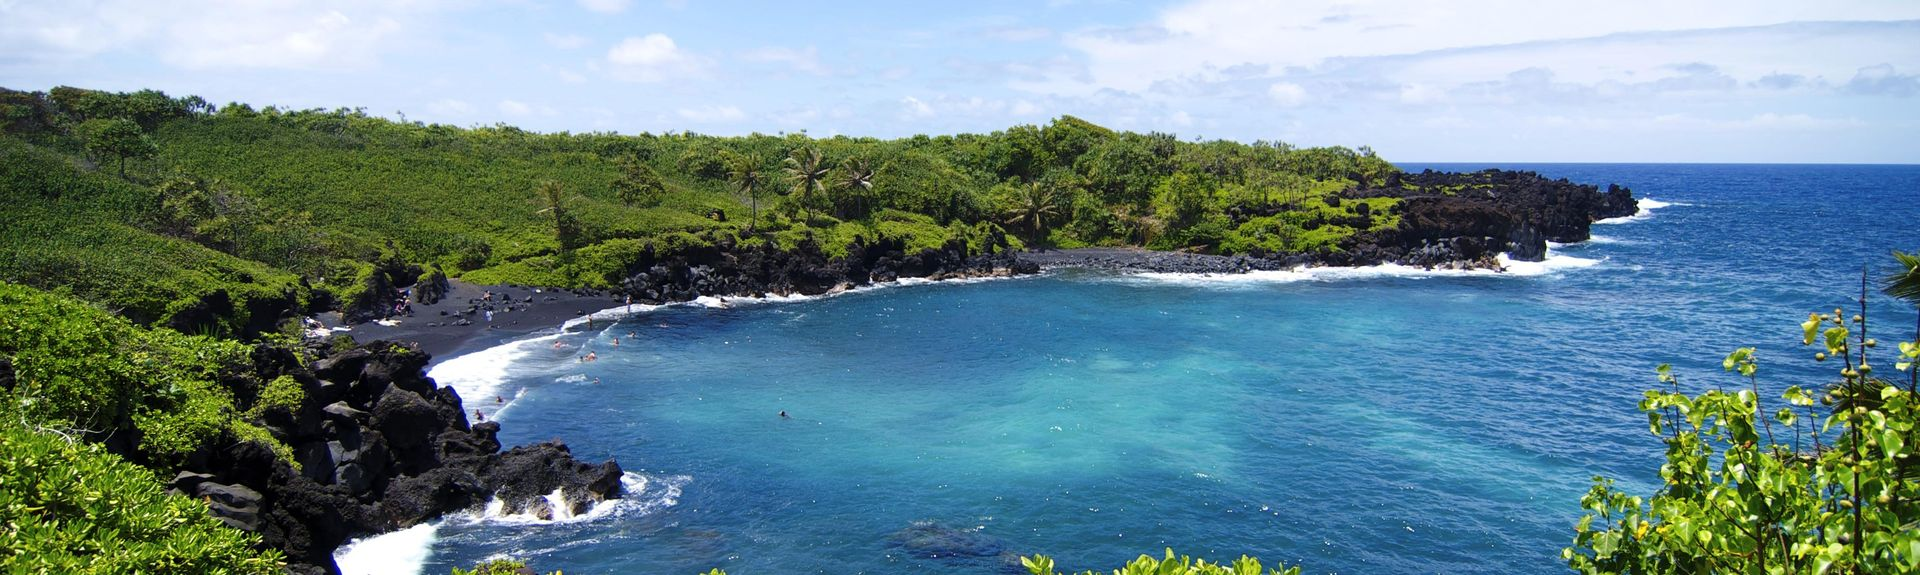 Wailua, Hana, Hawaii, United States of America